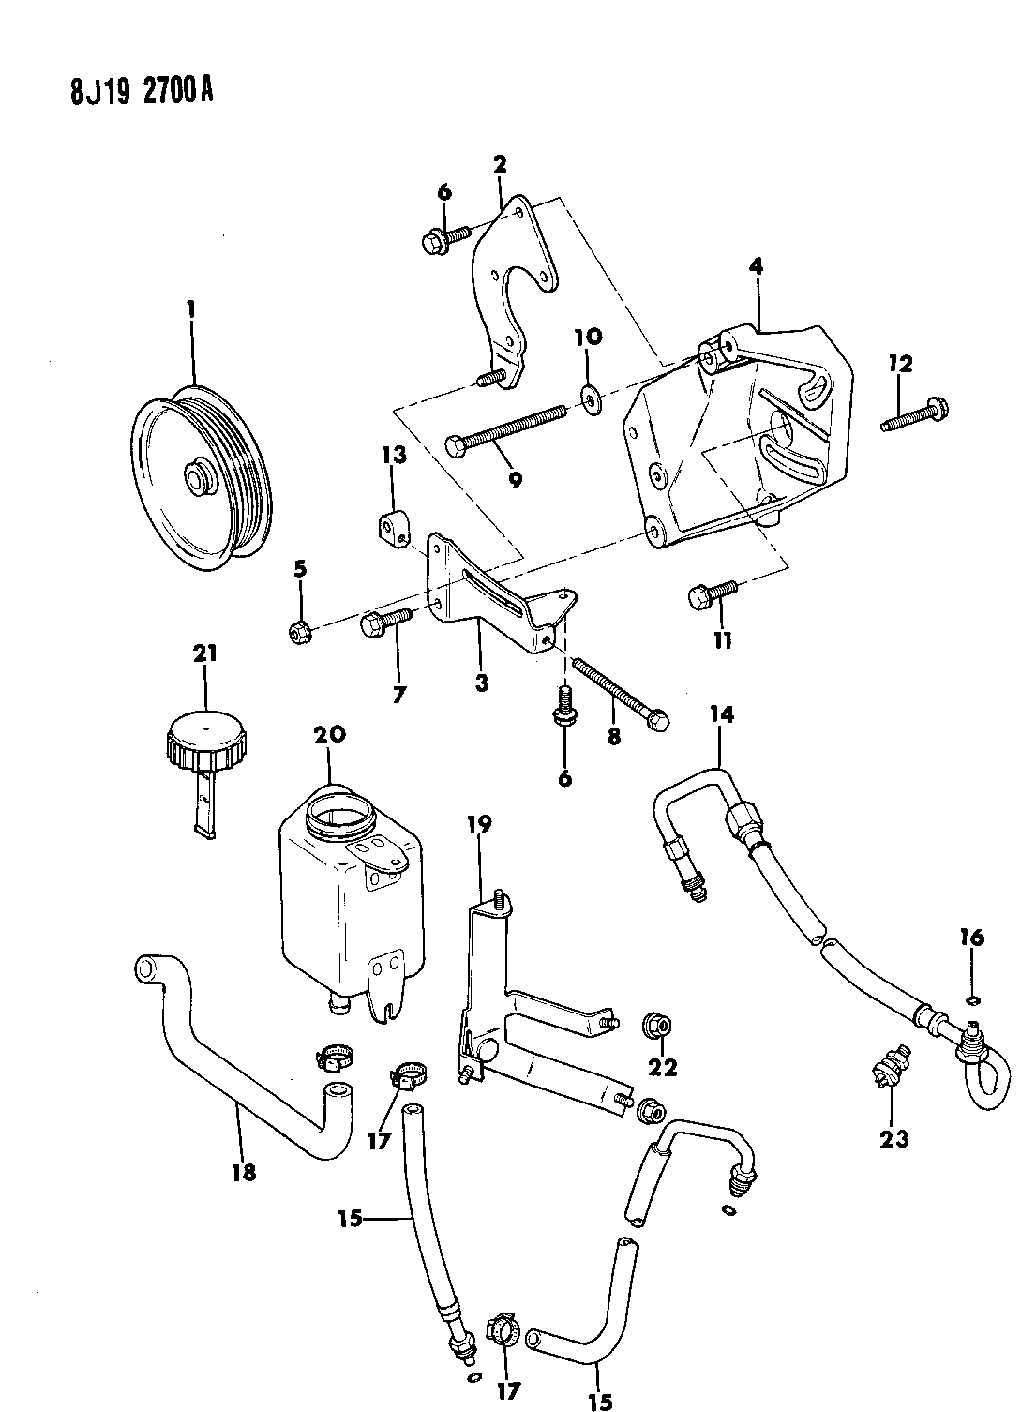 1988 jeep cherokee fuel line diagram 1988 jeep comanche pump mounting power steering  1988 jeep comanche pump mounting